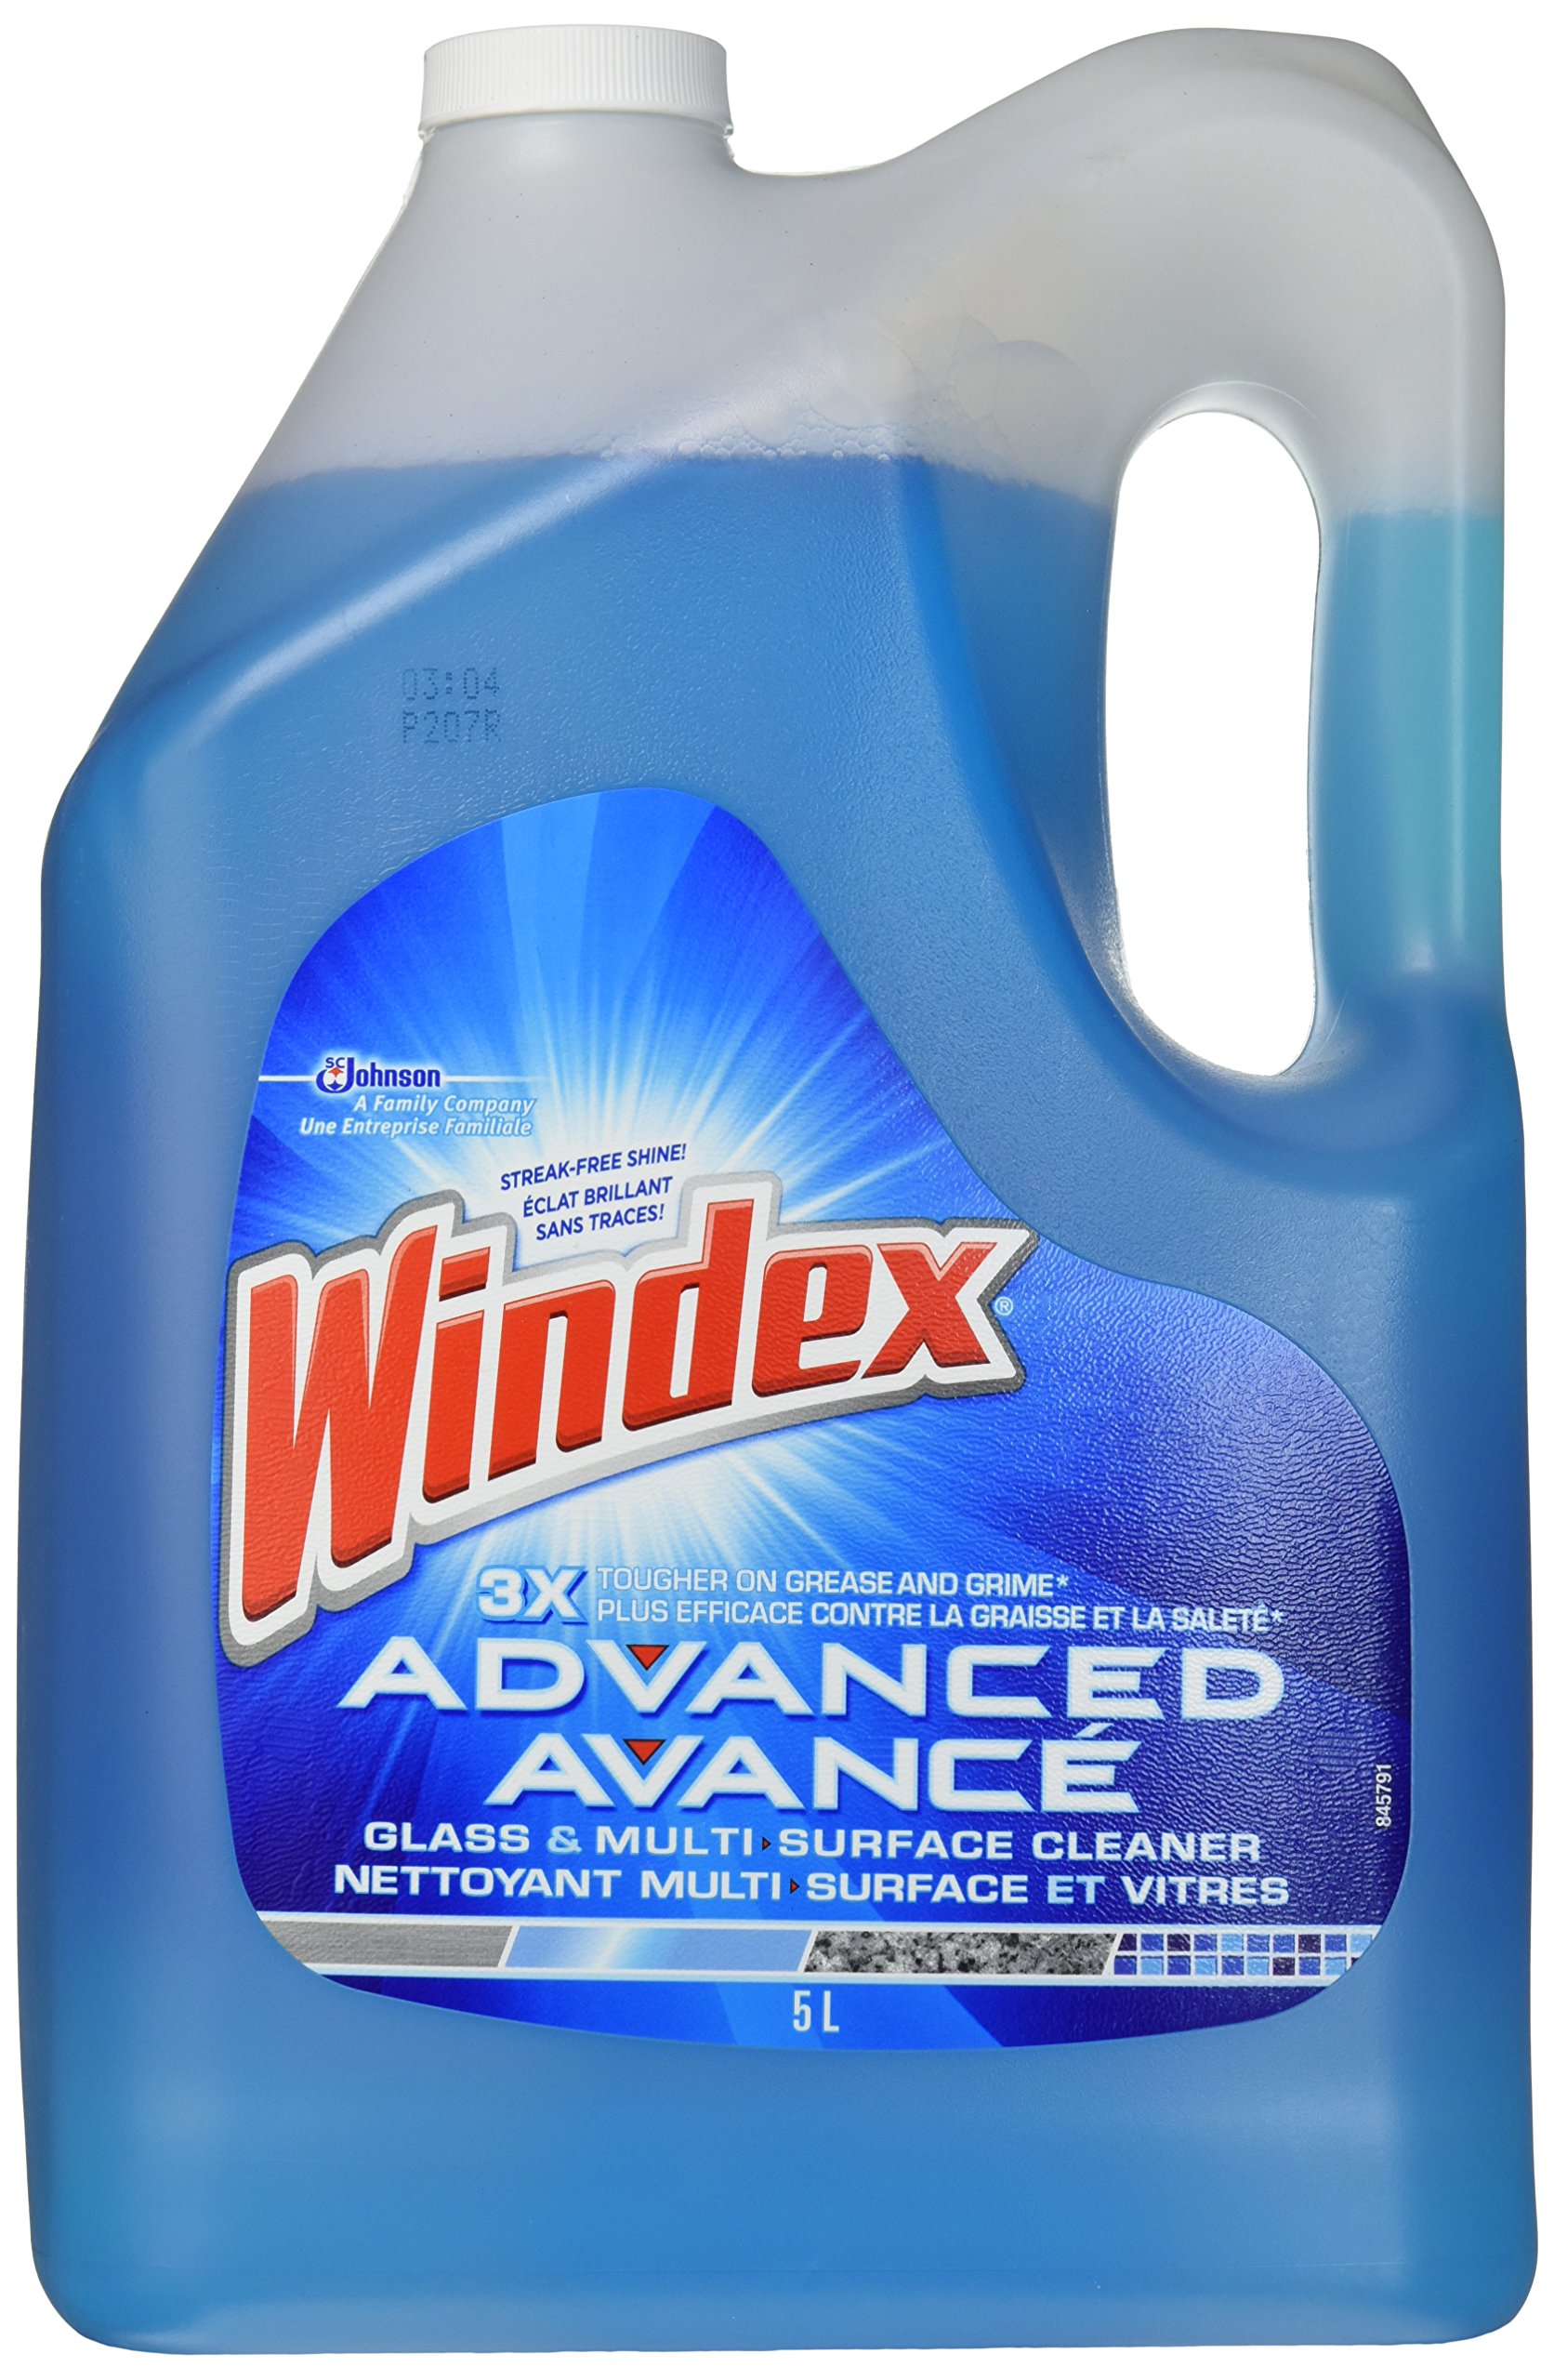 Windex Advanced Glass & Multi Surface Cleaner 172 Oz (1.34 Gallon) Refill